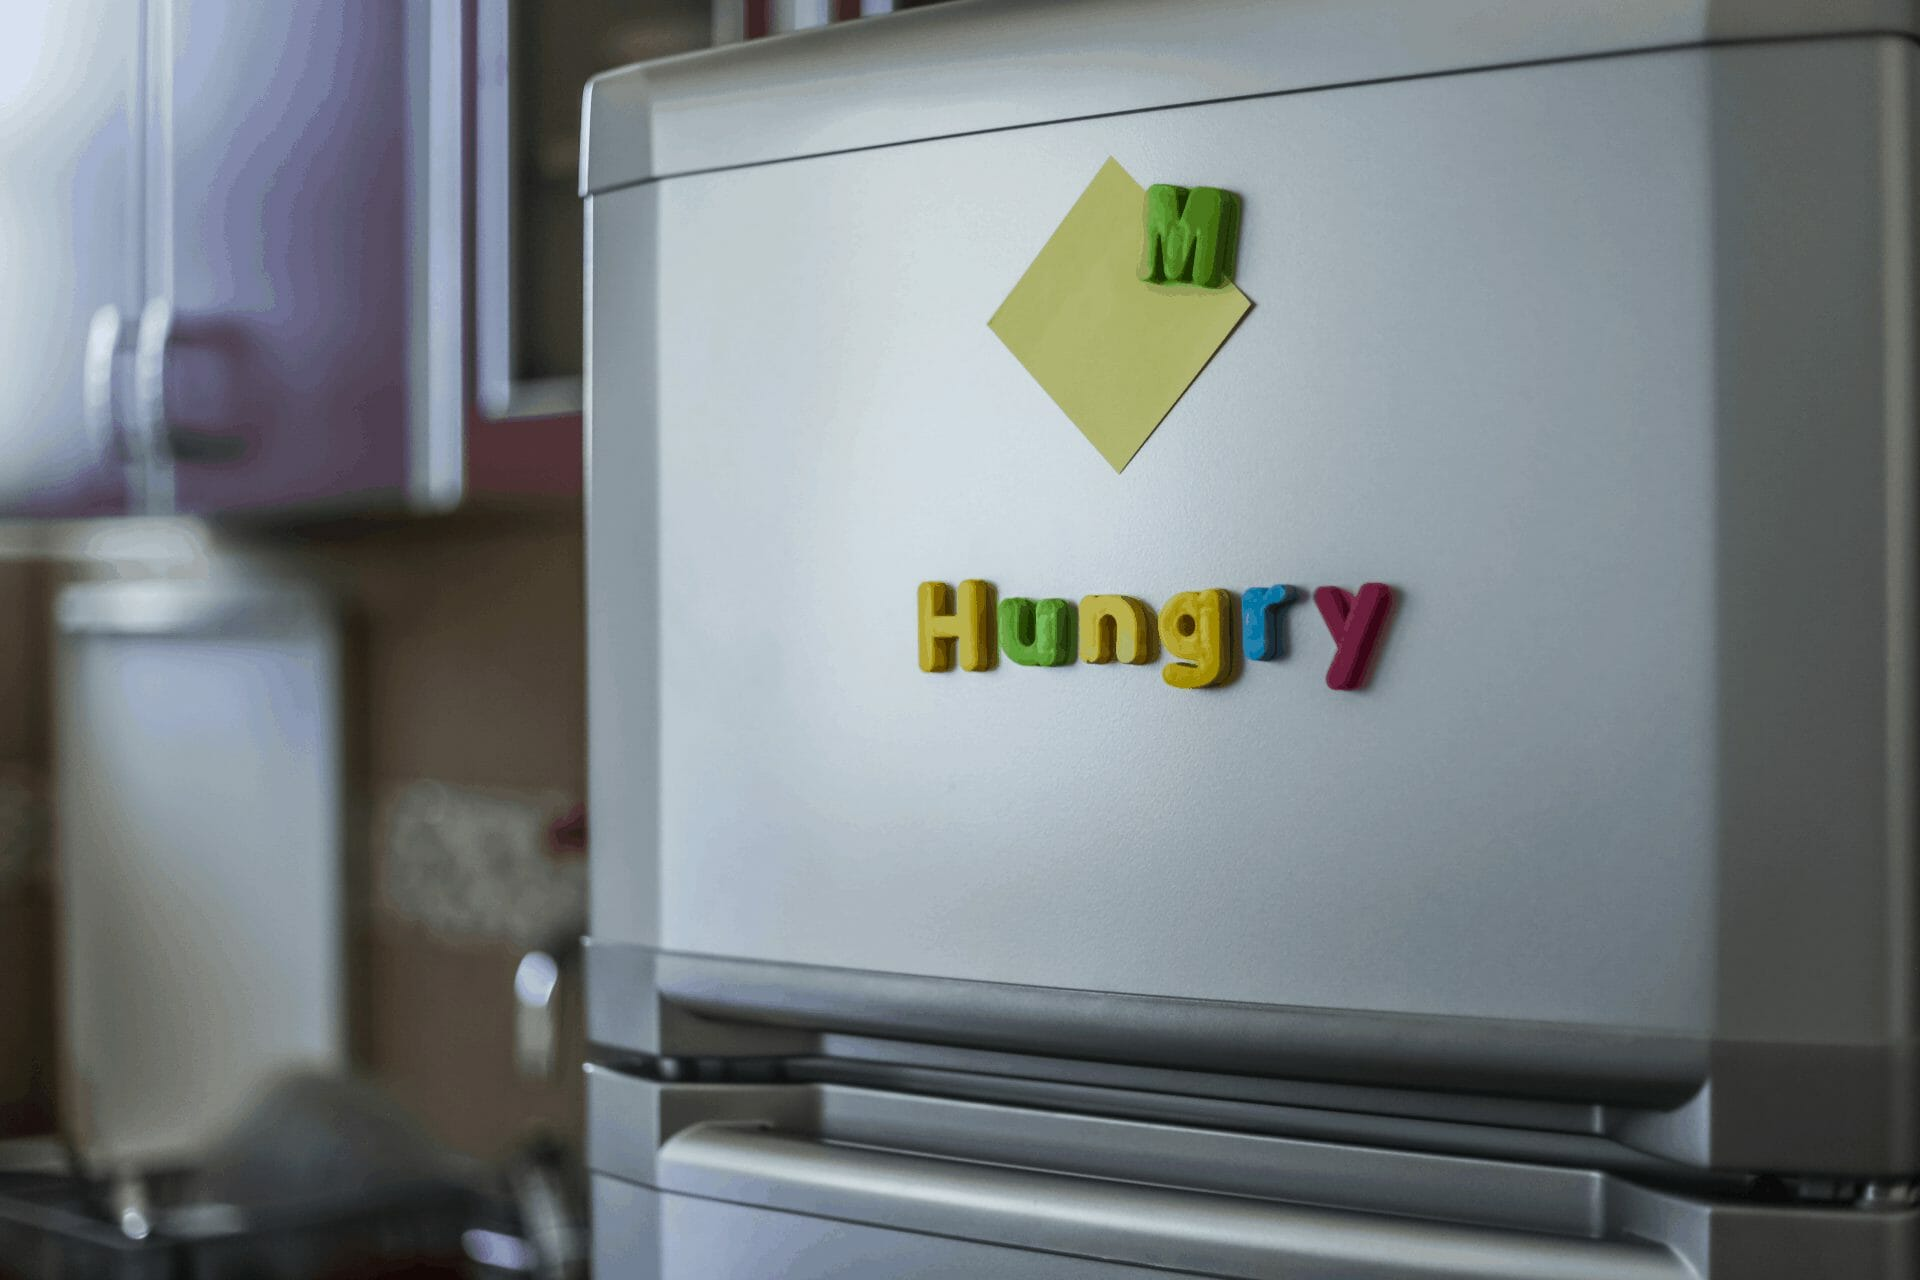 stickers on fridge